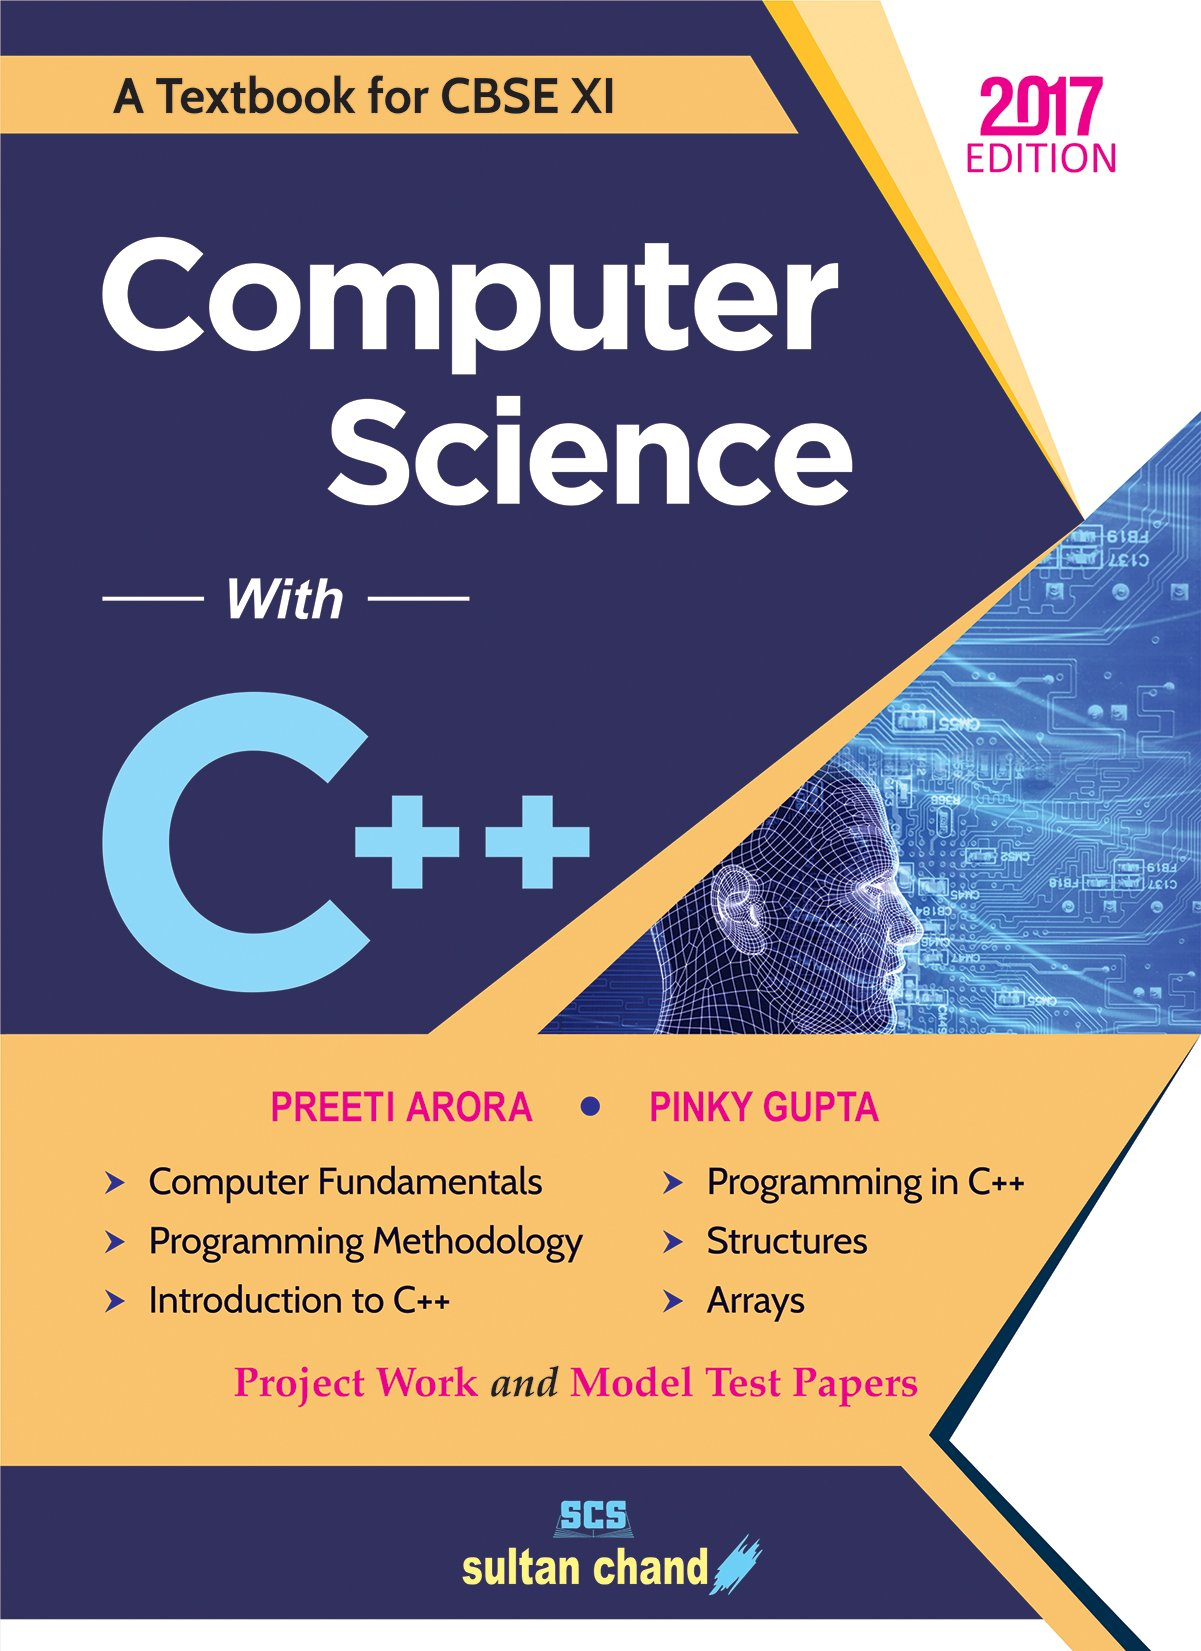 Class pdf textbook cbse 11 computer science